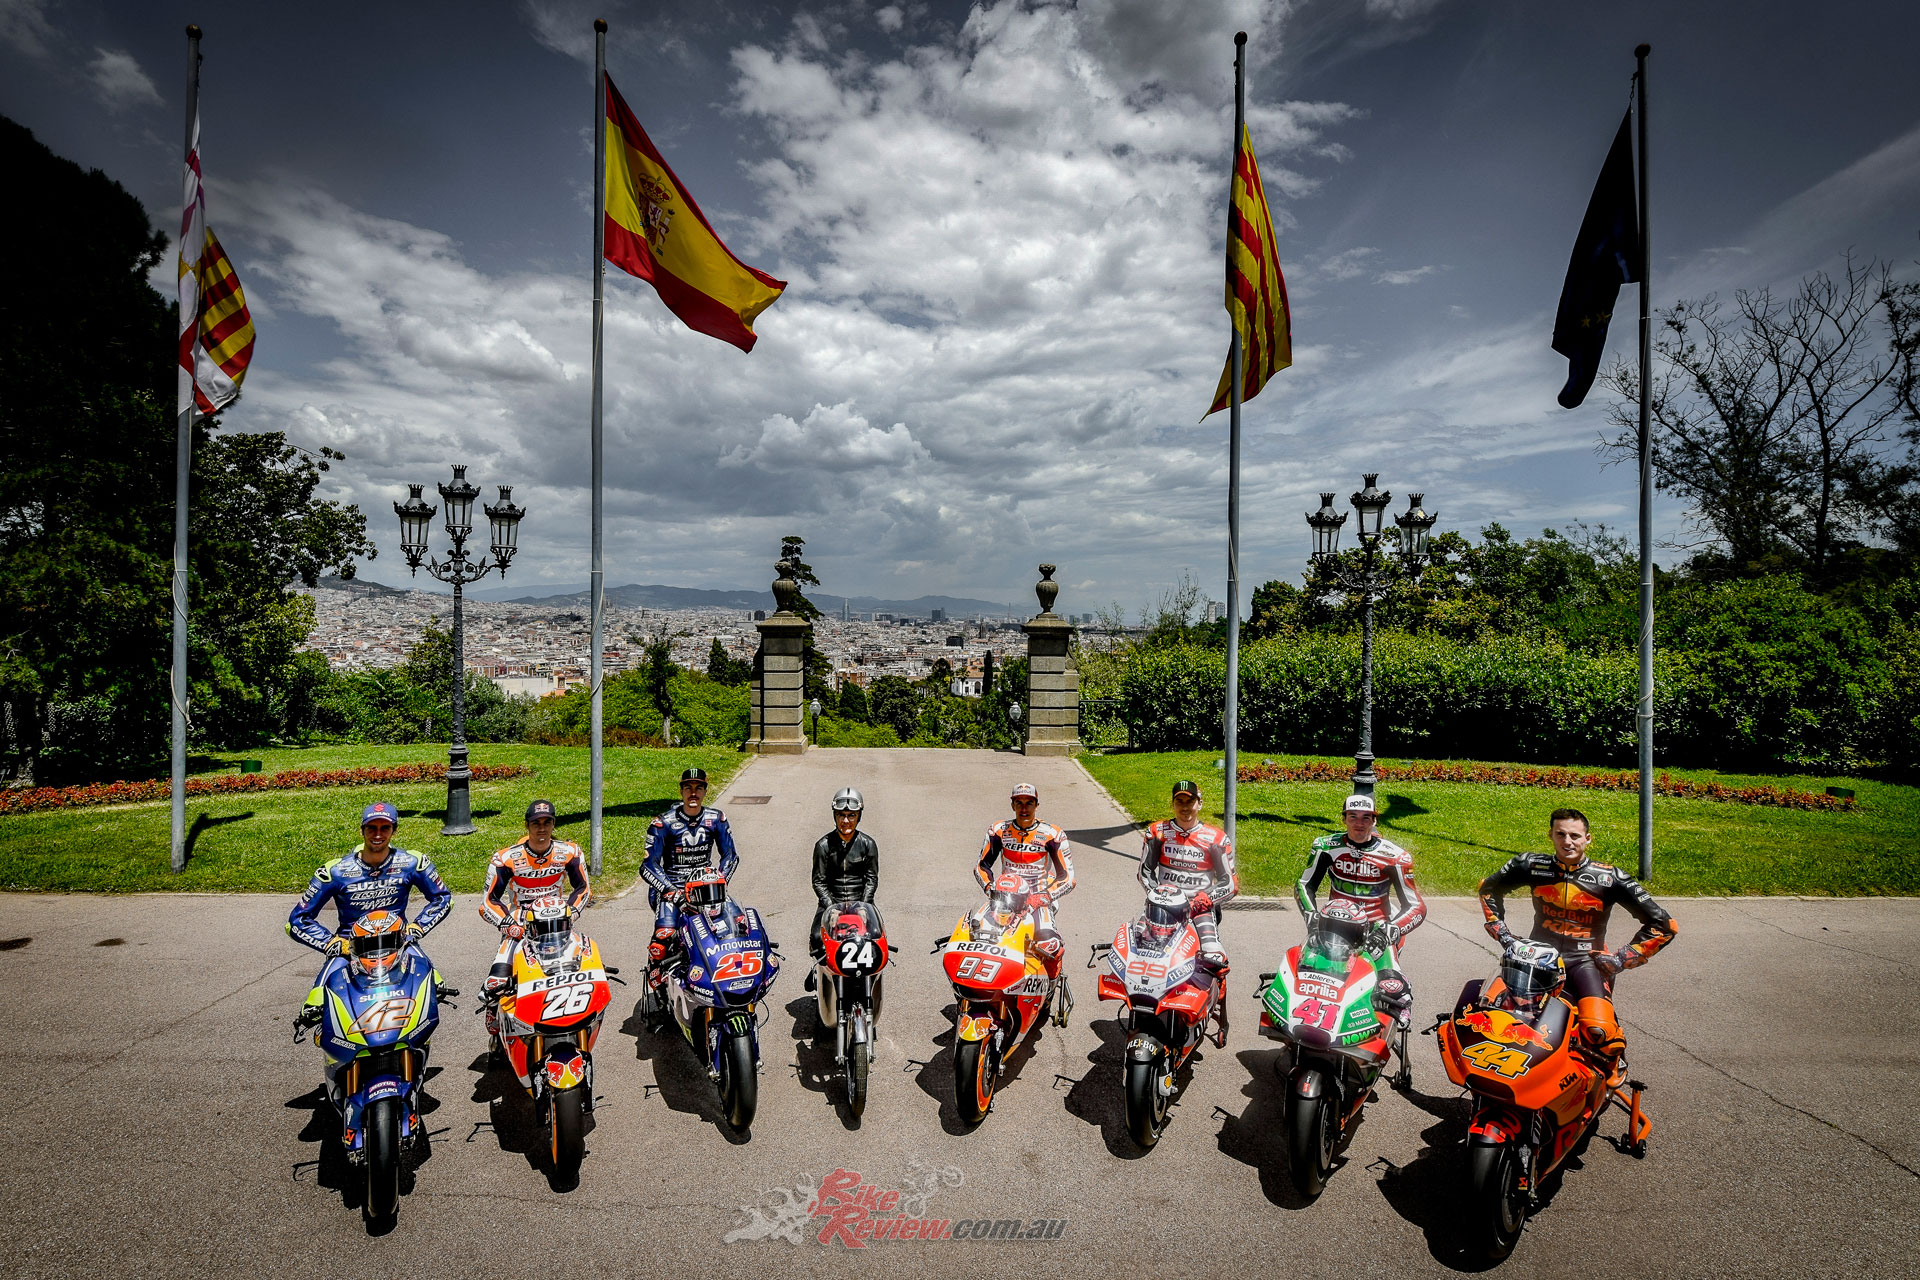 Rins, Pedrosa, Viñales, Cañellas on his Bultaco TSS 125, Marquez, Lorenzo, Aleix Espargaro and Pol Espargaro